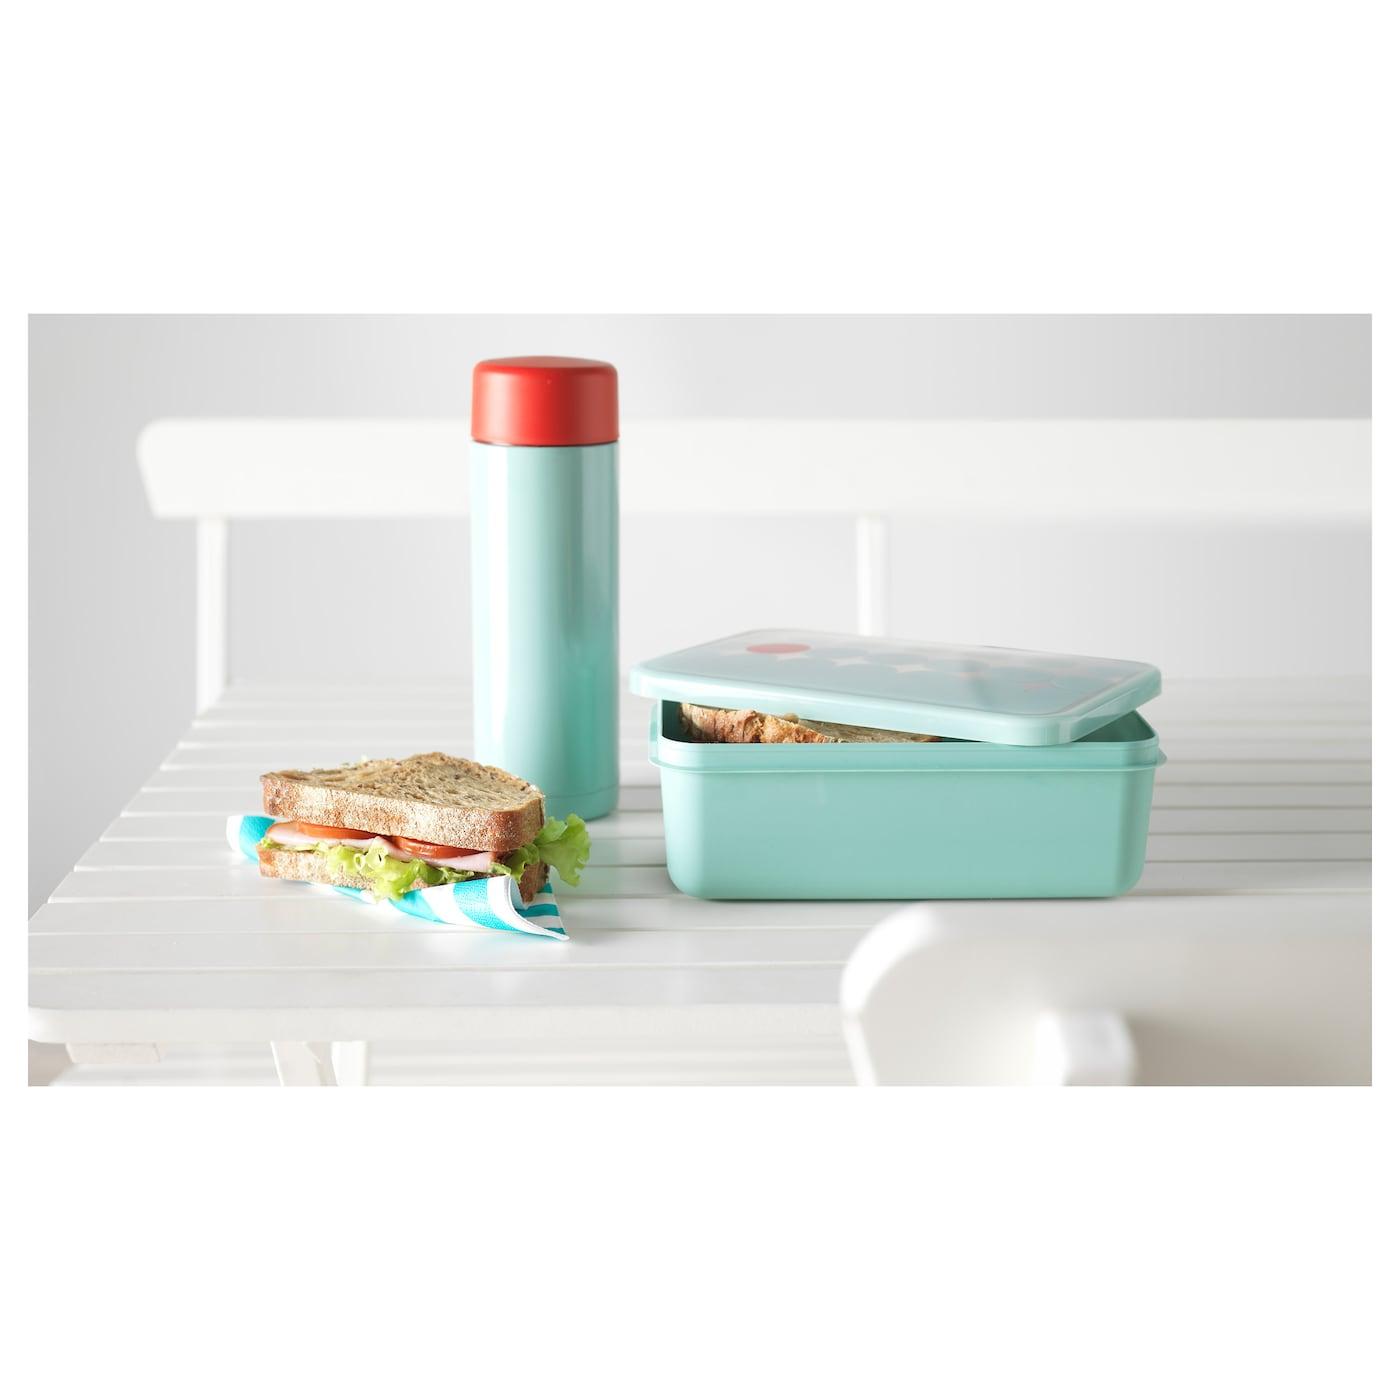 KULLAR Lunch Box Light Blue 23x15x8 Cm